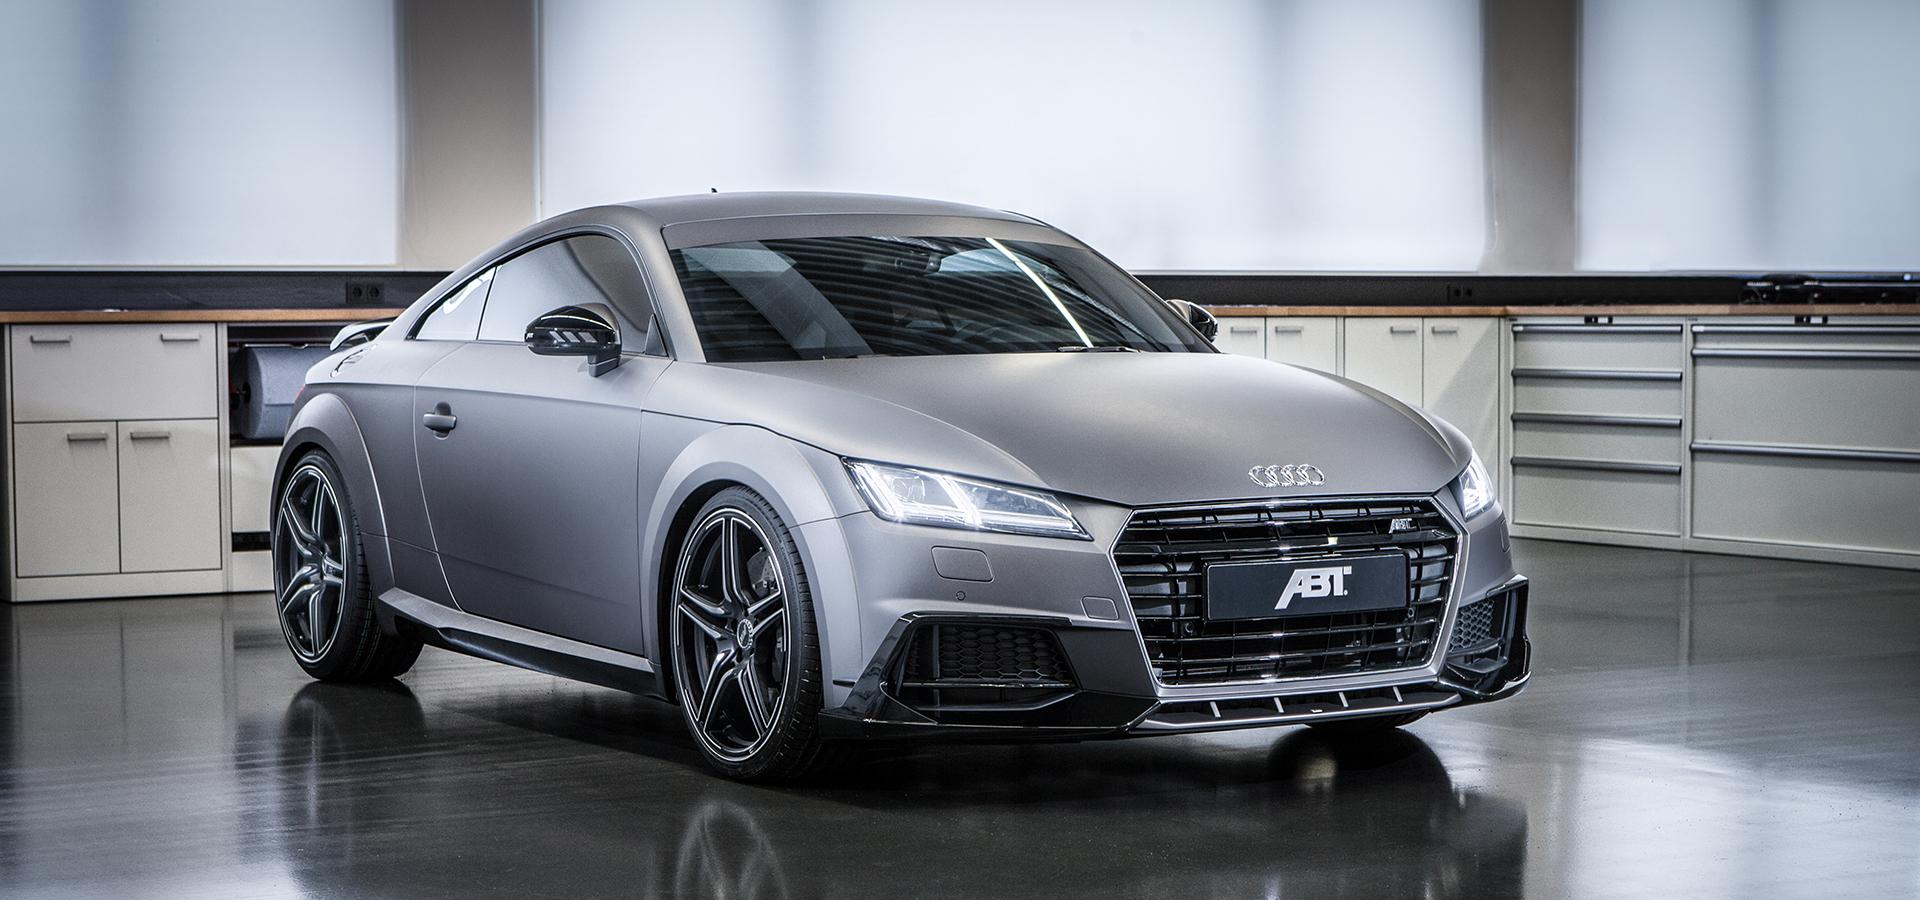 Audi TT - ABT Sportsline